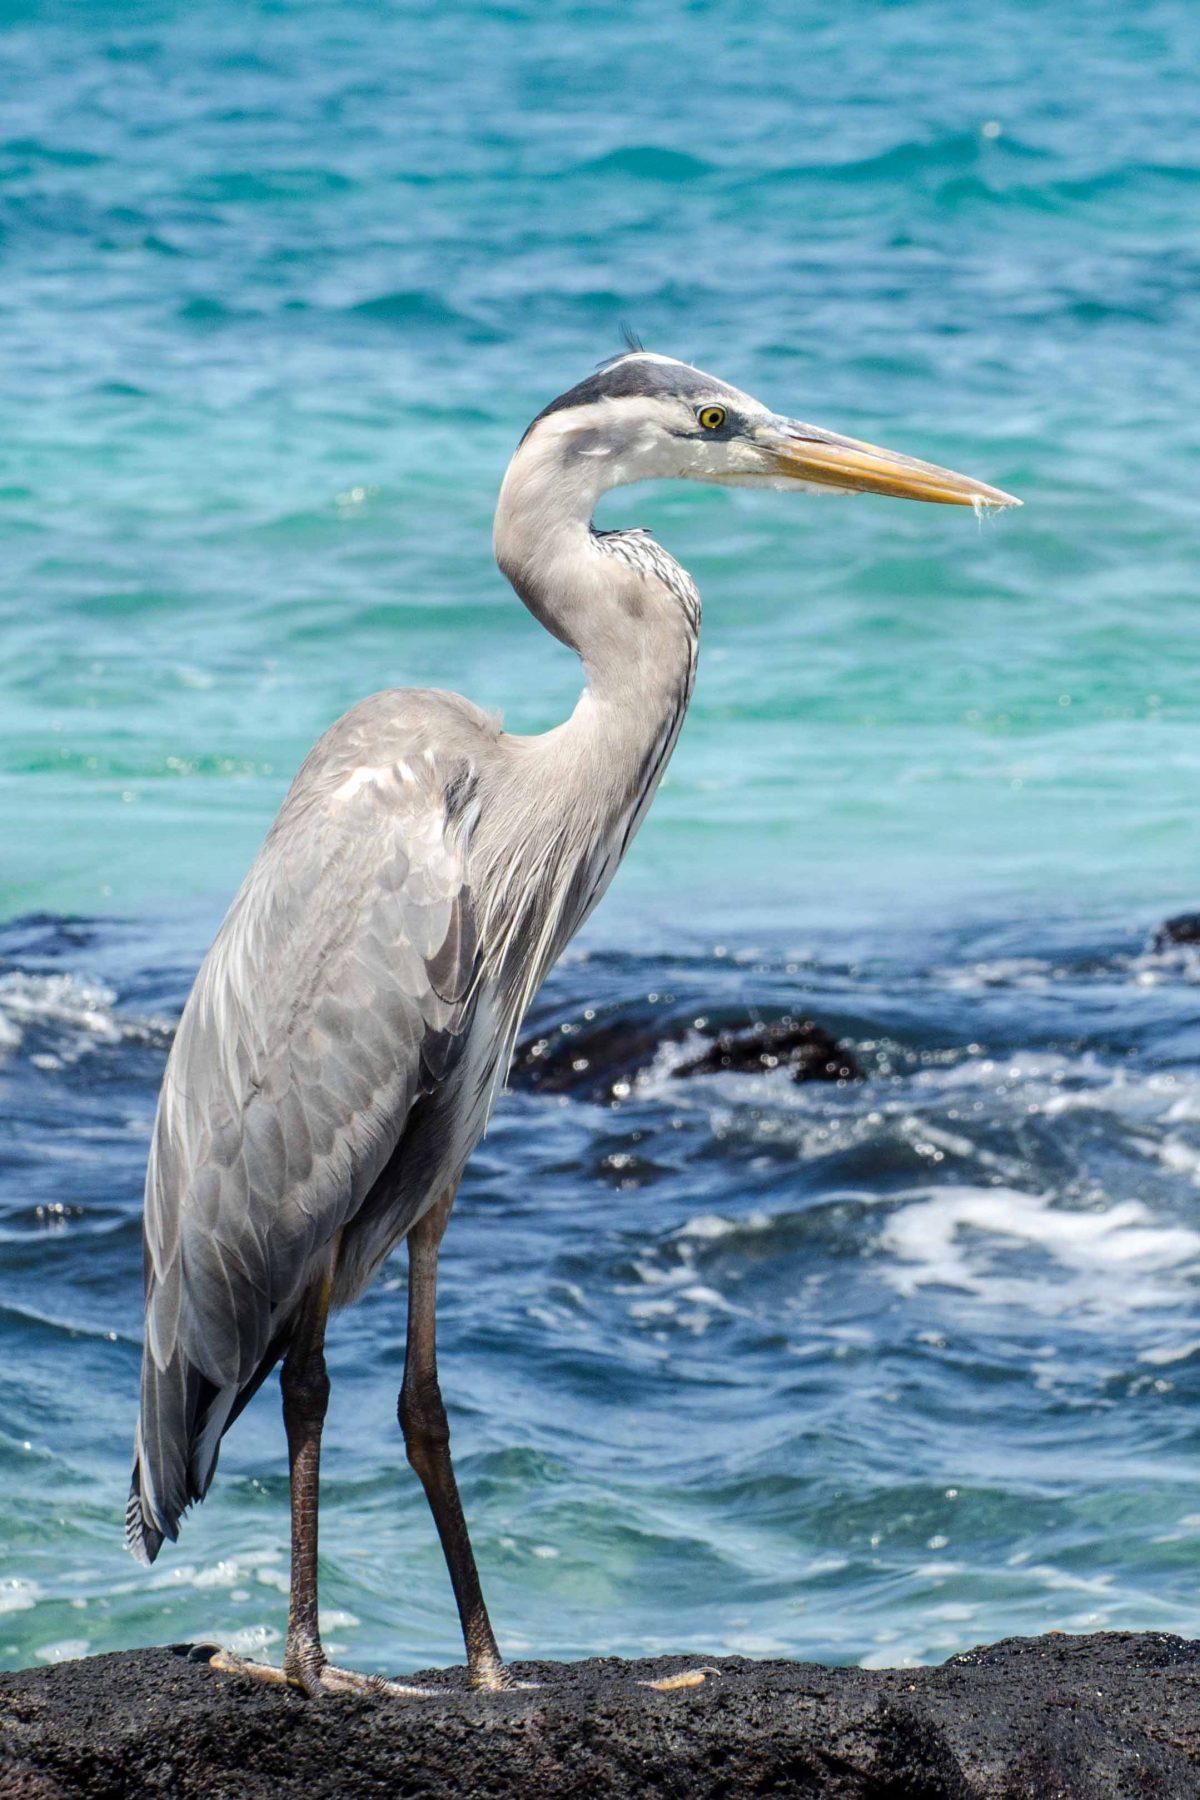 Great Blue Heron, San Cristobal Island, the Galapagos, Ecuador | ©Angie Drake